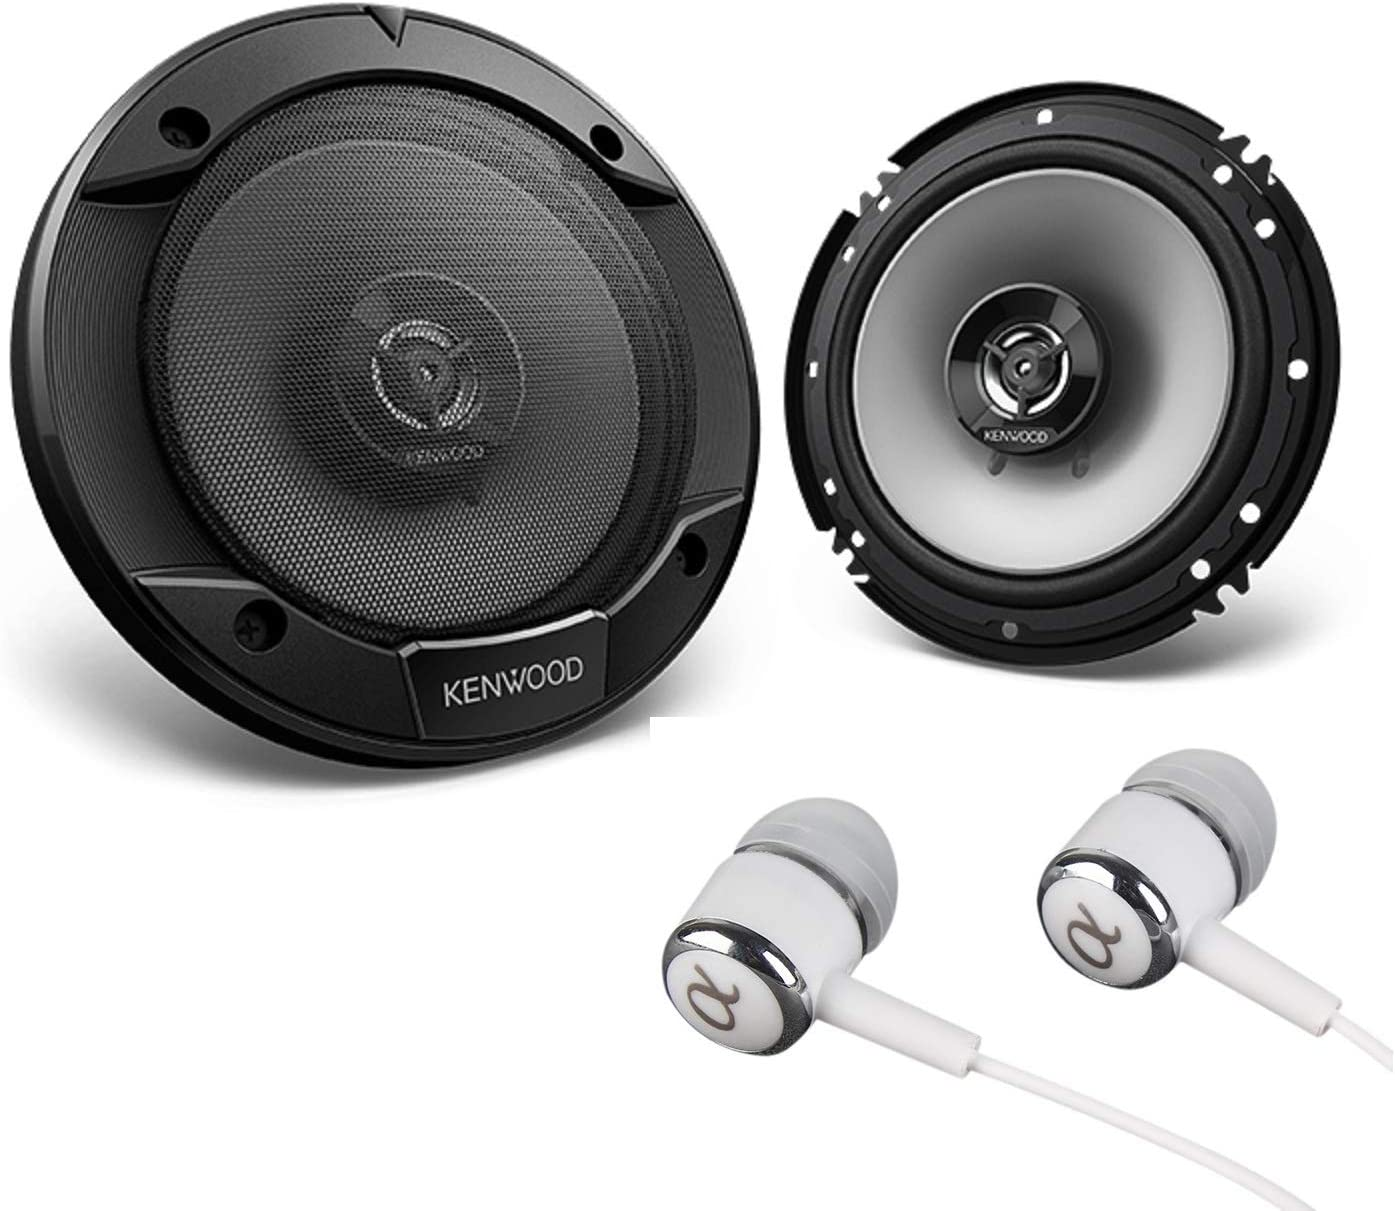 "Kenwood 6-1/2"" 300W Max (60W RMS per Pair) 6.5"" KFC 2-Way Sport Series Flush Mount Car Audio Door Coaxial Speakers Bundled with Alphasonik Earbuds"